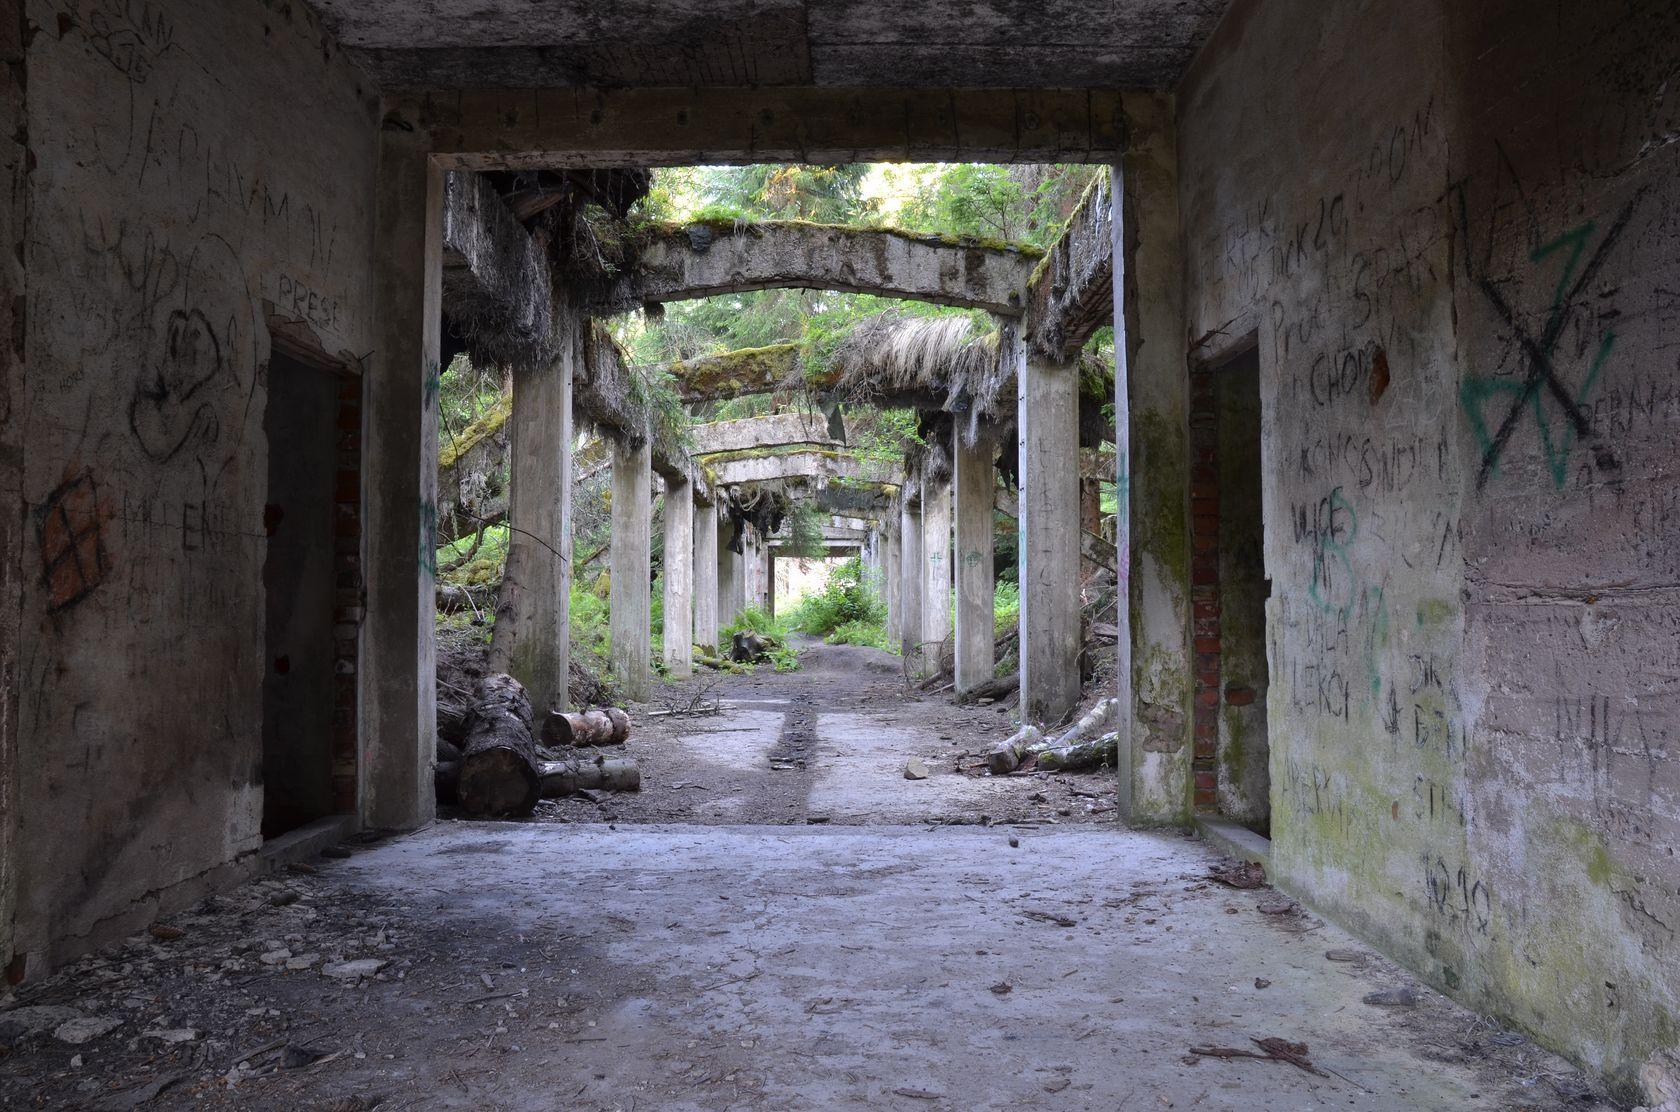 bývalý důl Rolava - Sauersack